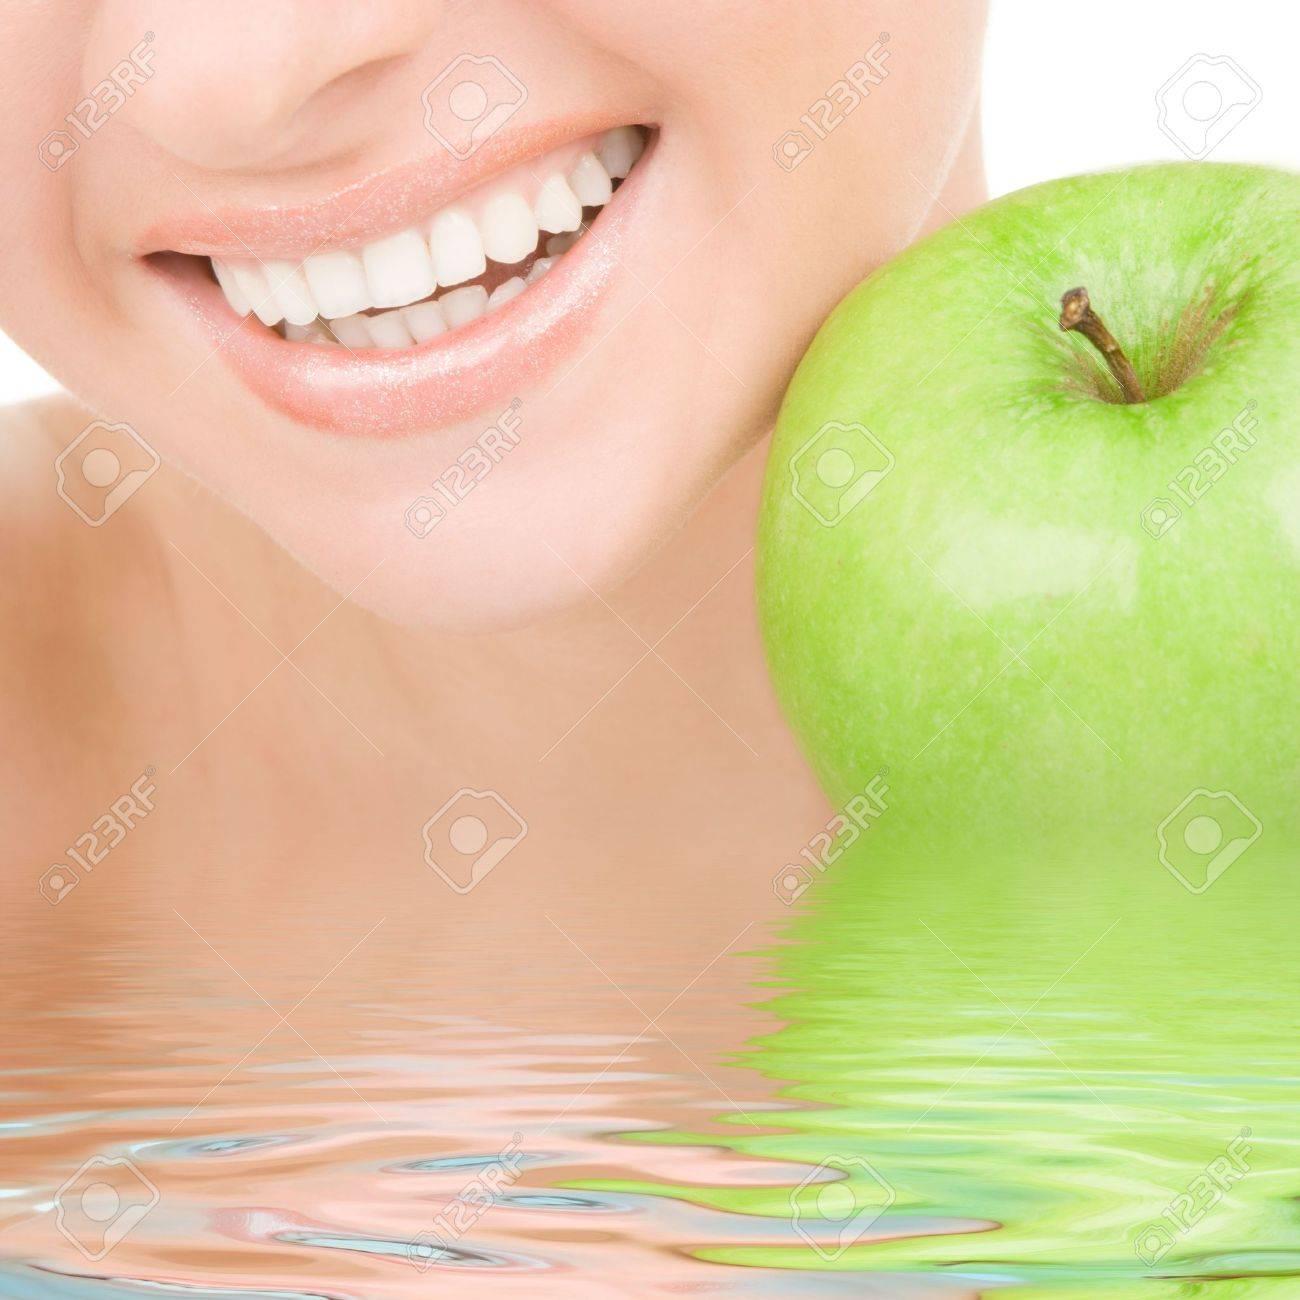 healthy teeth and green apple Stock Photo - 5334965